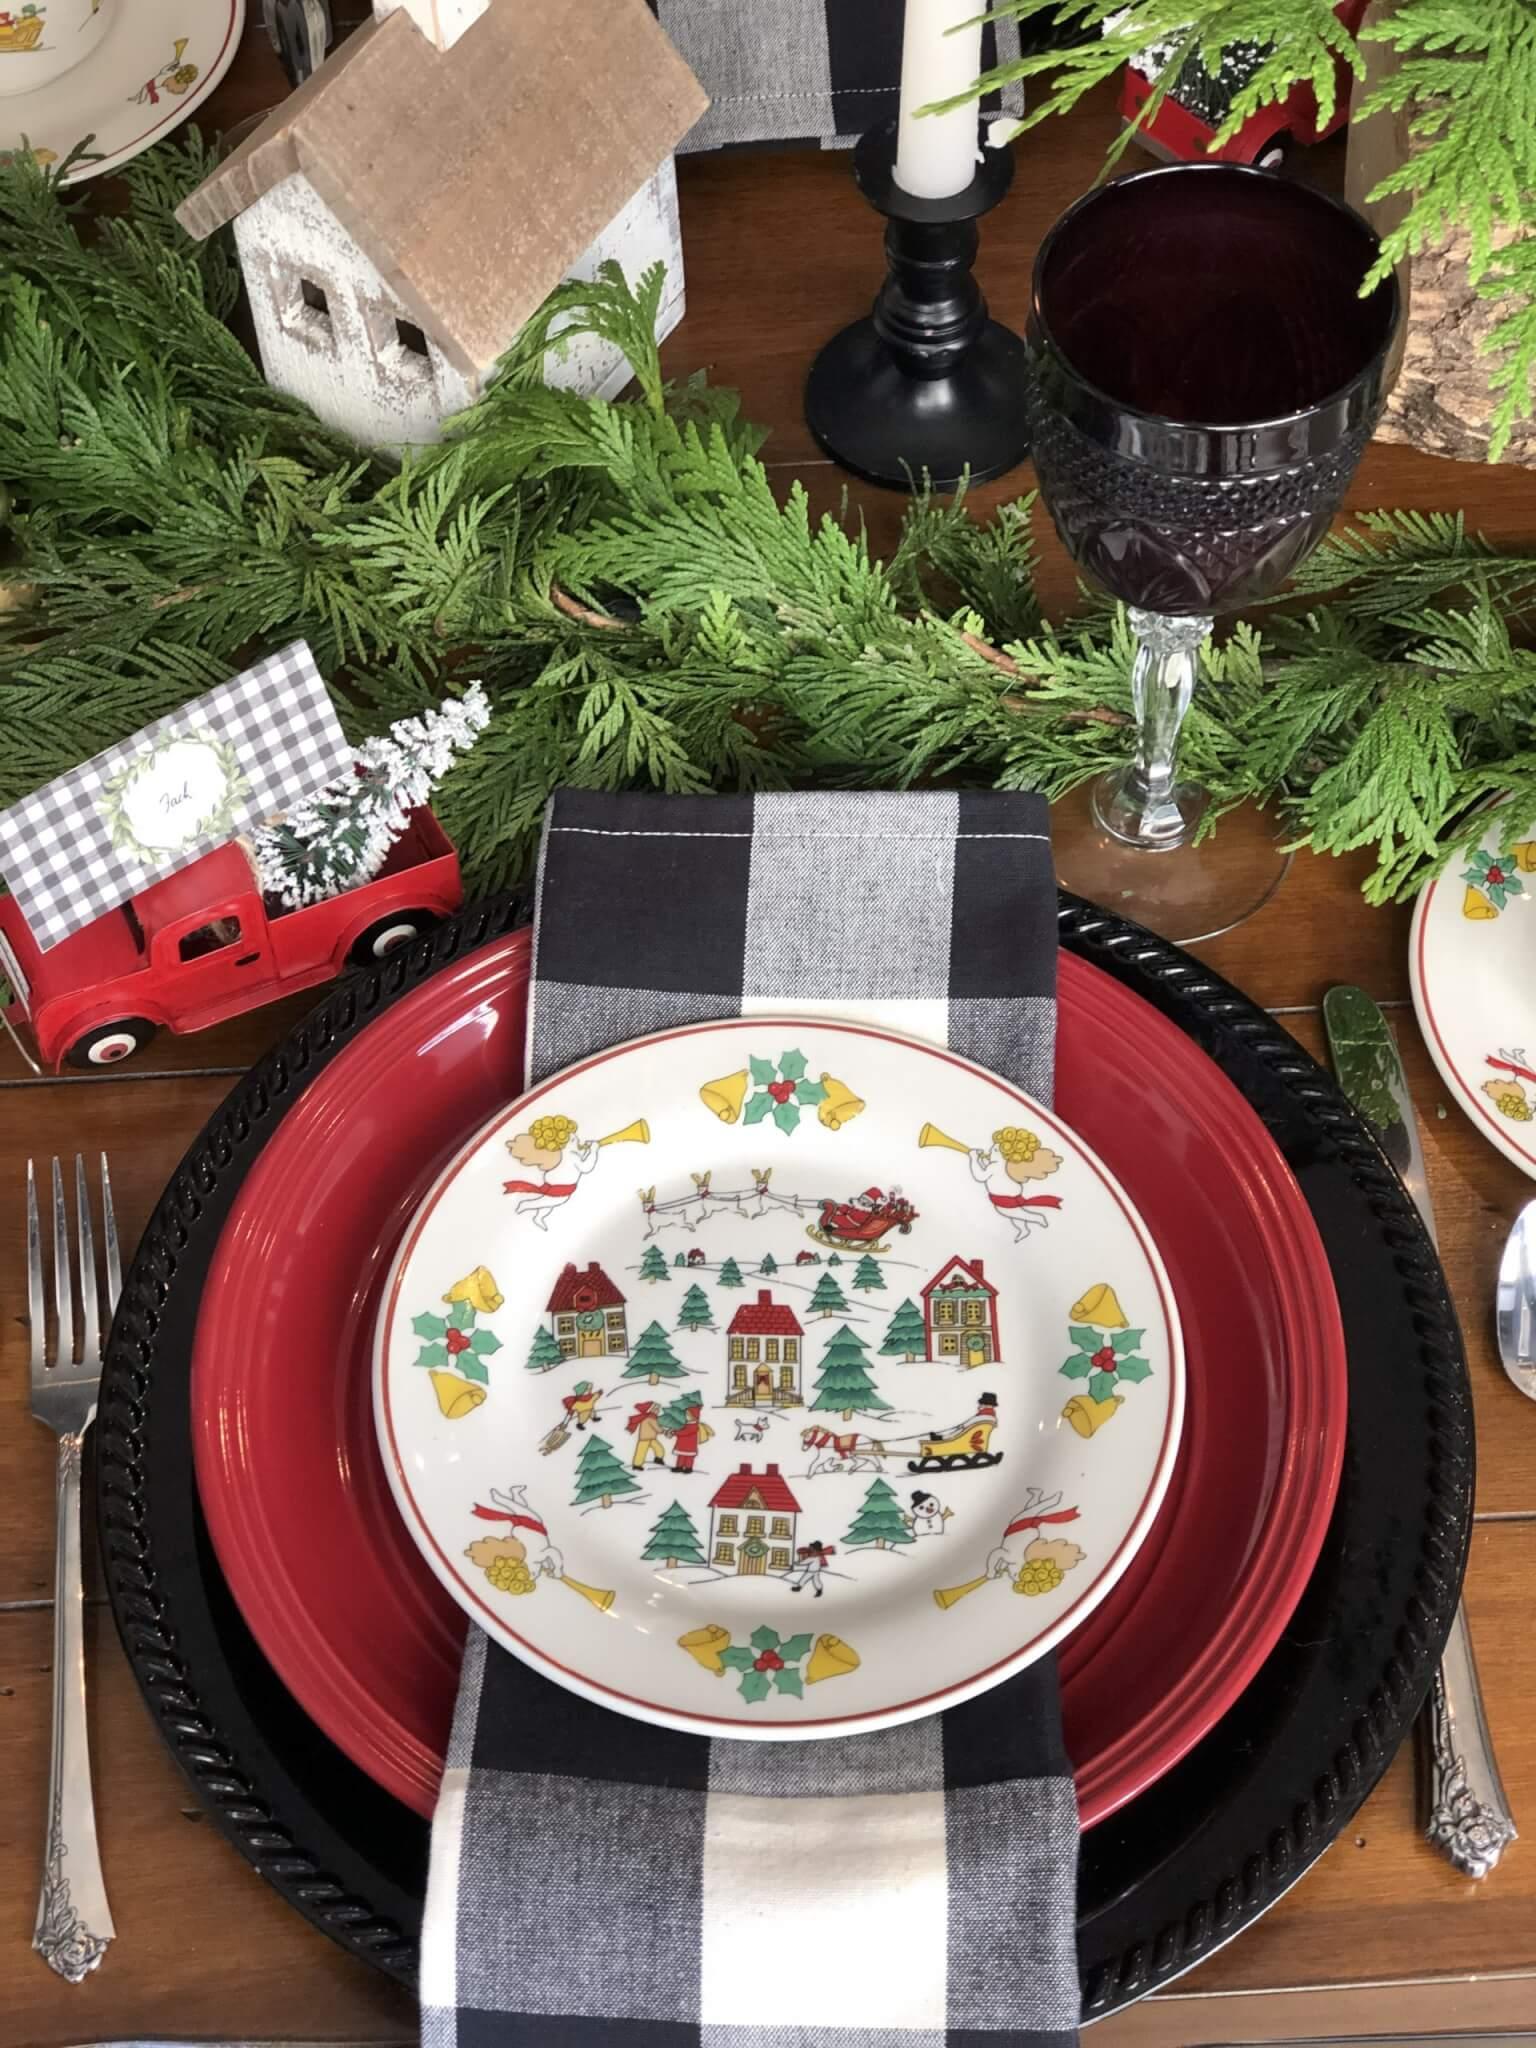 Home for the Holidays Christmas dessert plates.rt